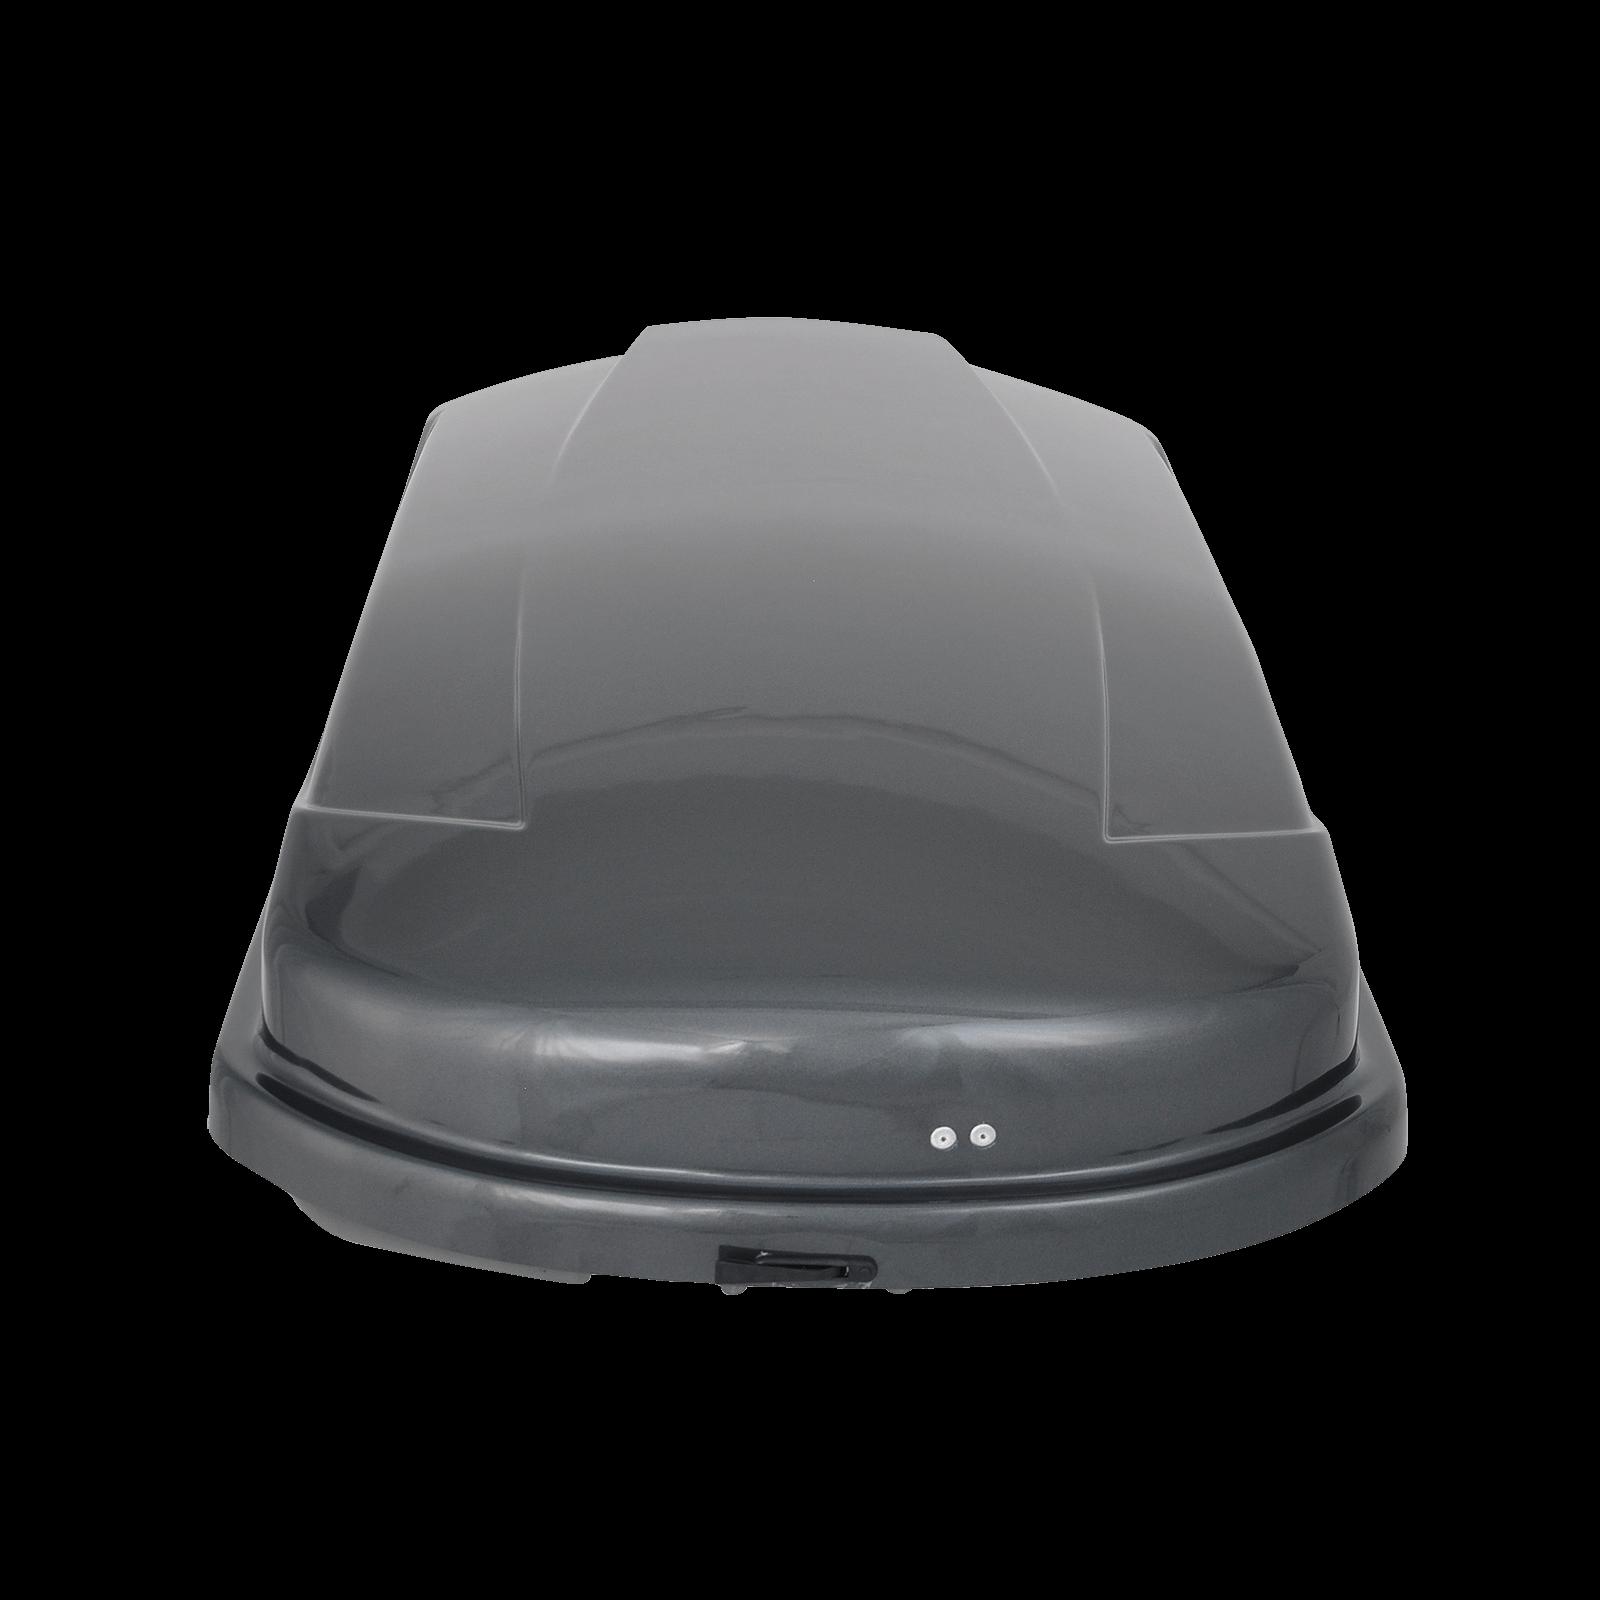 Dachbox Junior Xtreme 500 grau glänzend - Bild 3